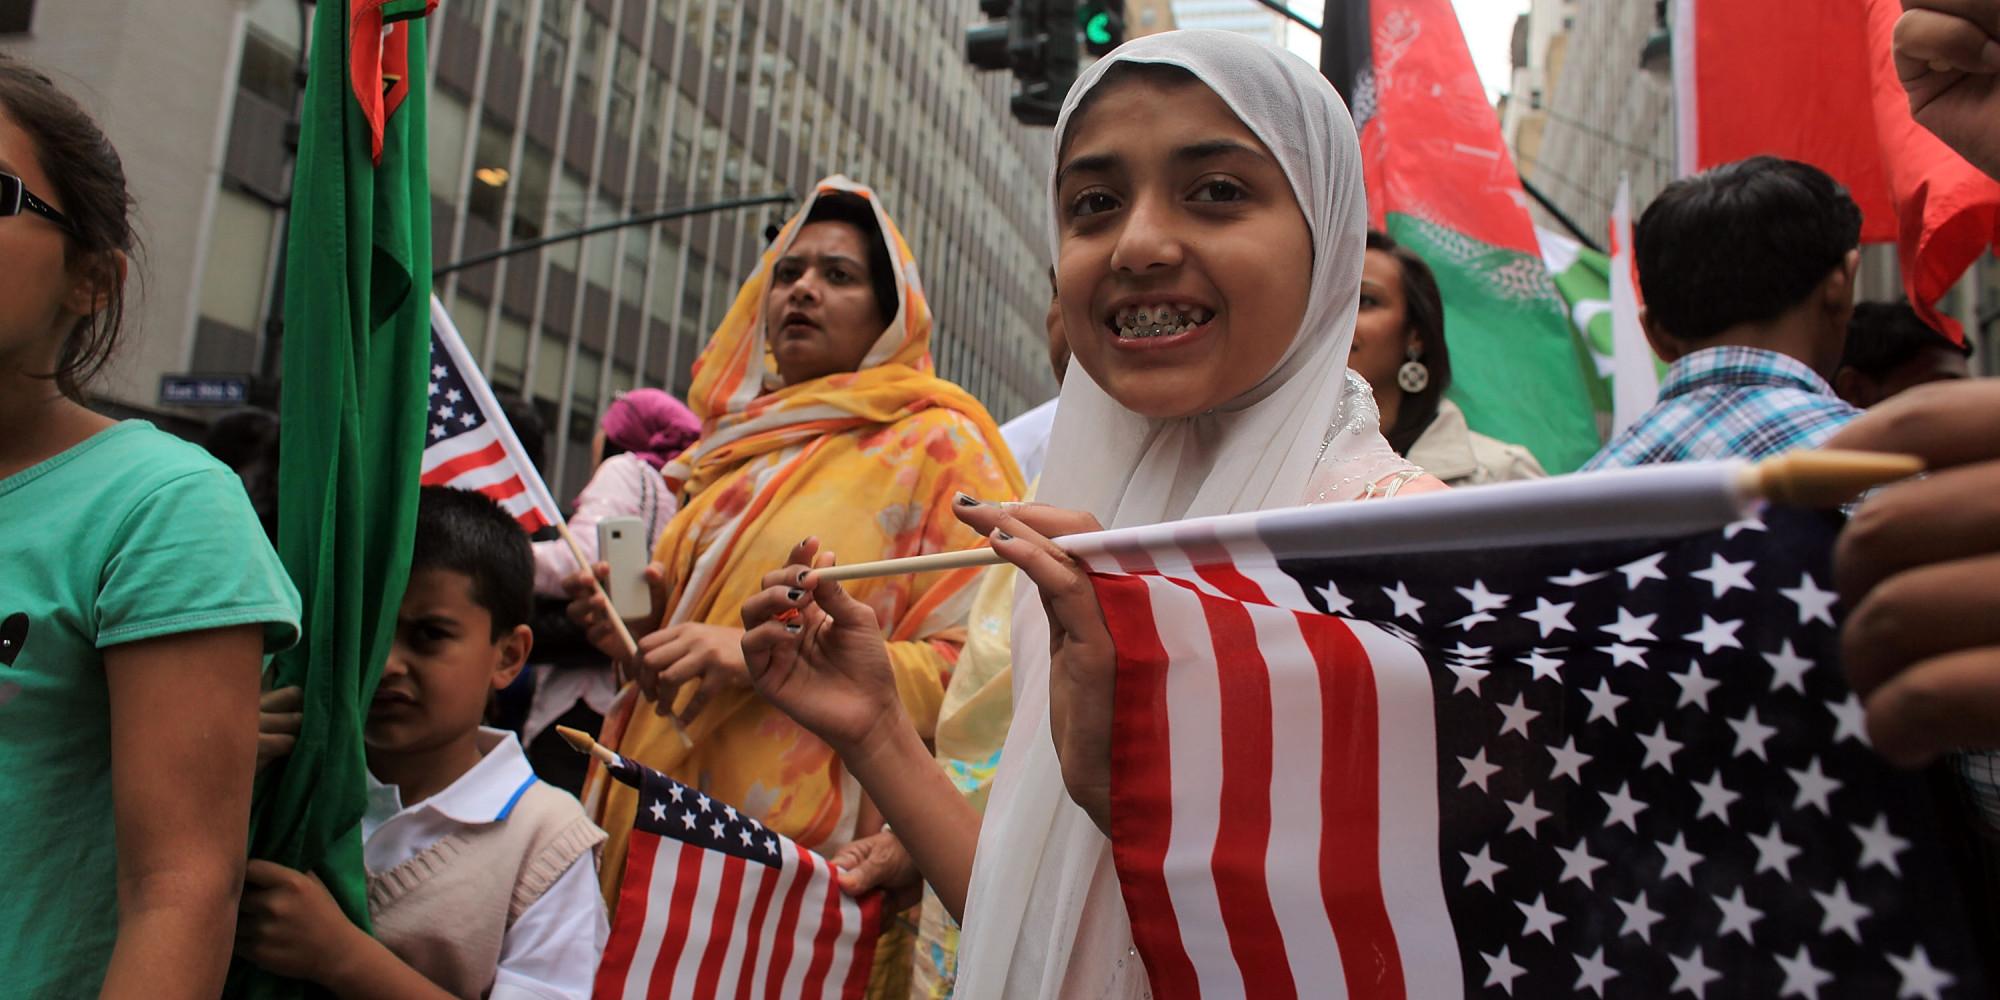 https://i1.wp.com/i.huffpost.com/gen/1700590/images/o-AMERICAN-MUSLIMS-PARADE-facebook.jpg